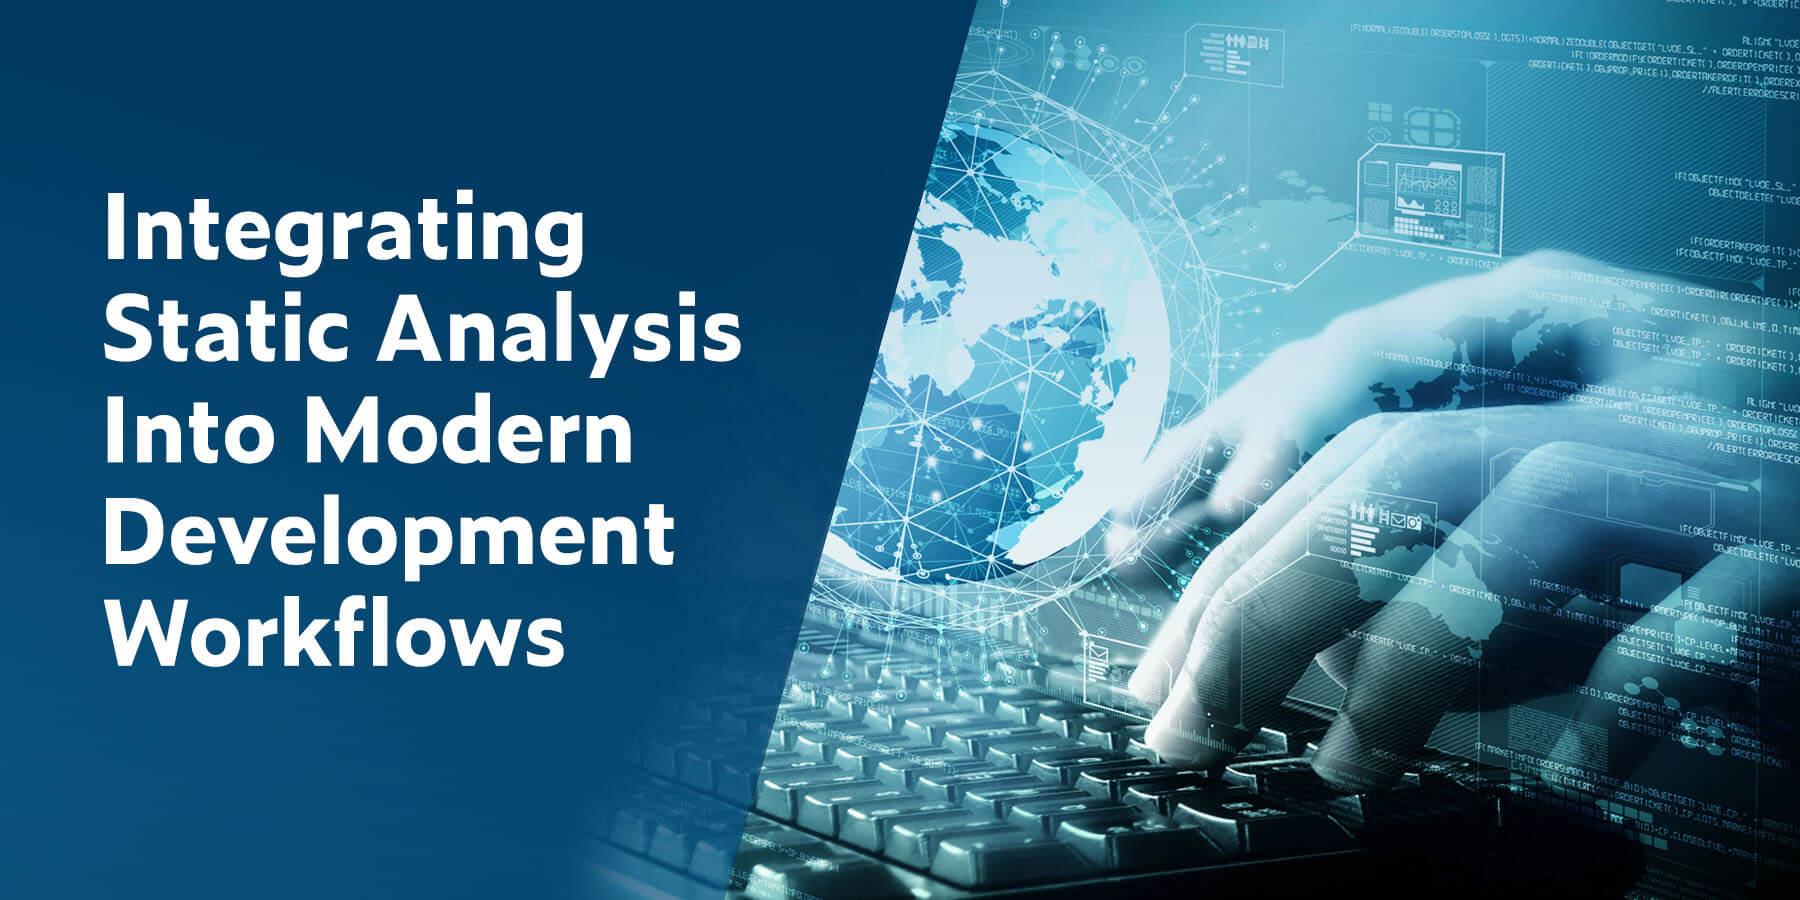 Integrating Static Analysis Into Modern Development Workflows